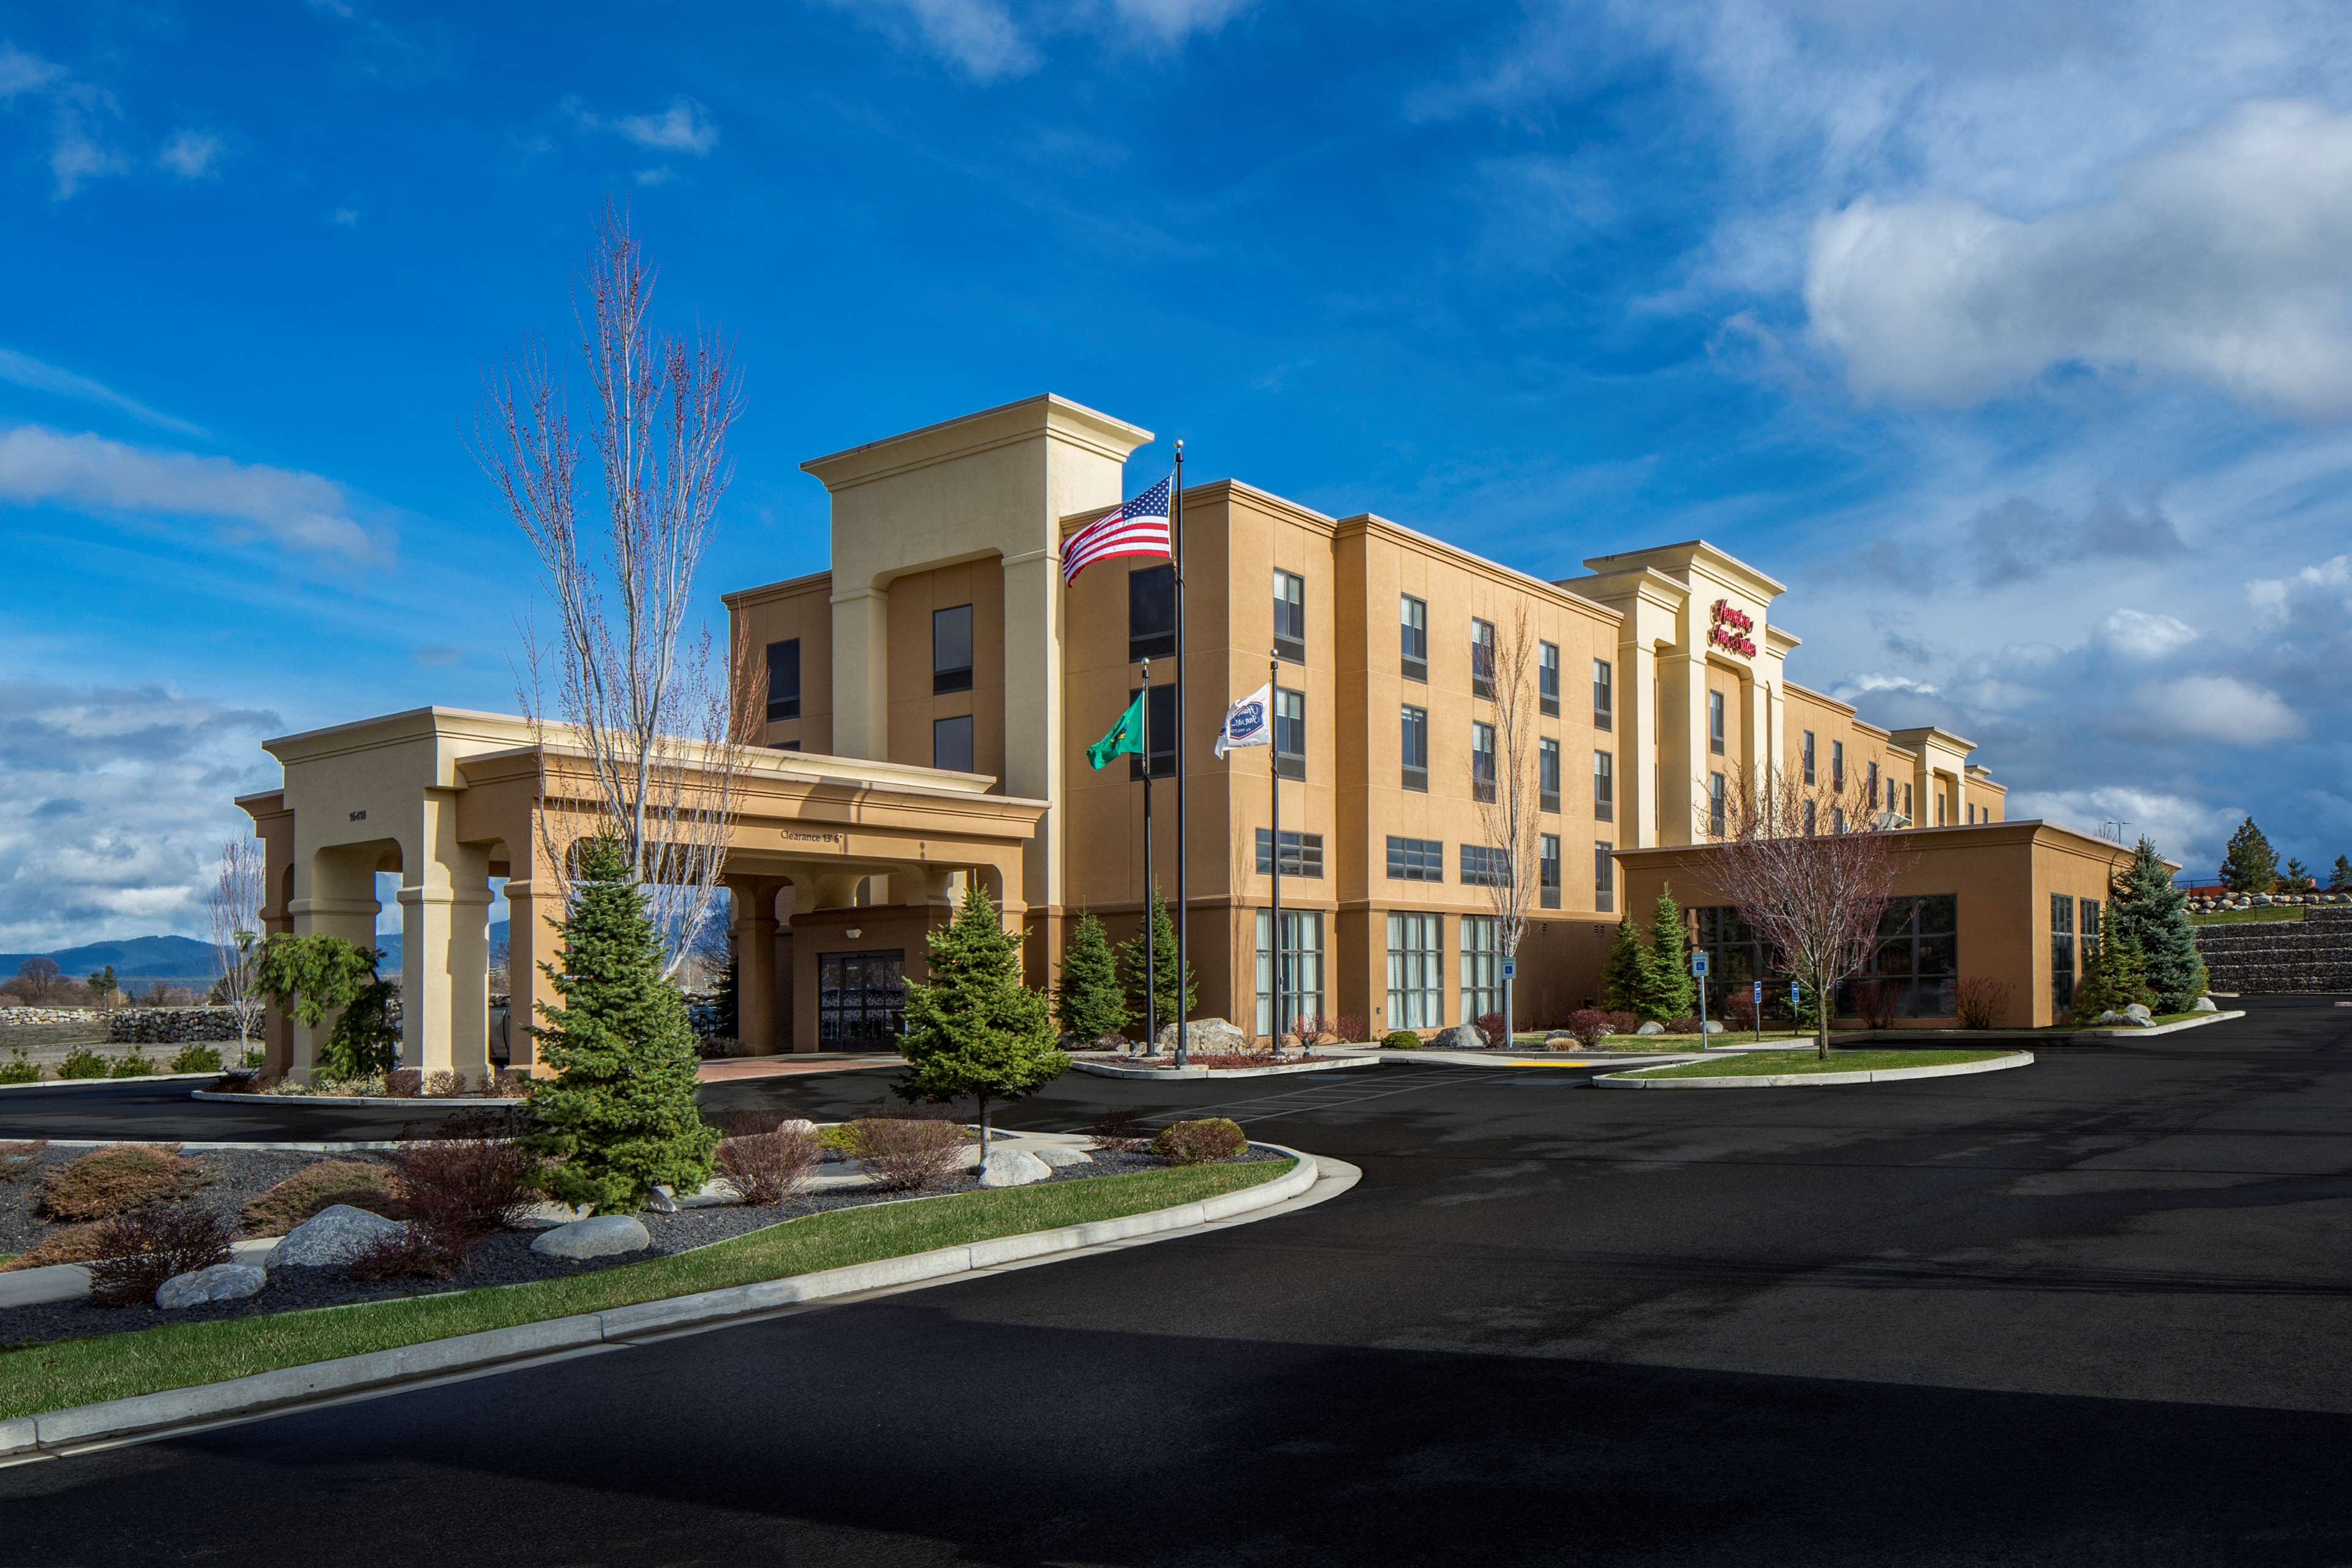 Hampton Inn & Suites Spokane Valley image 1